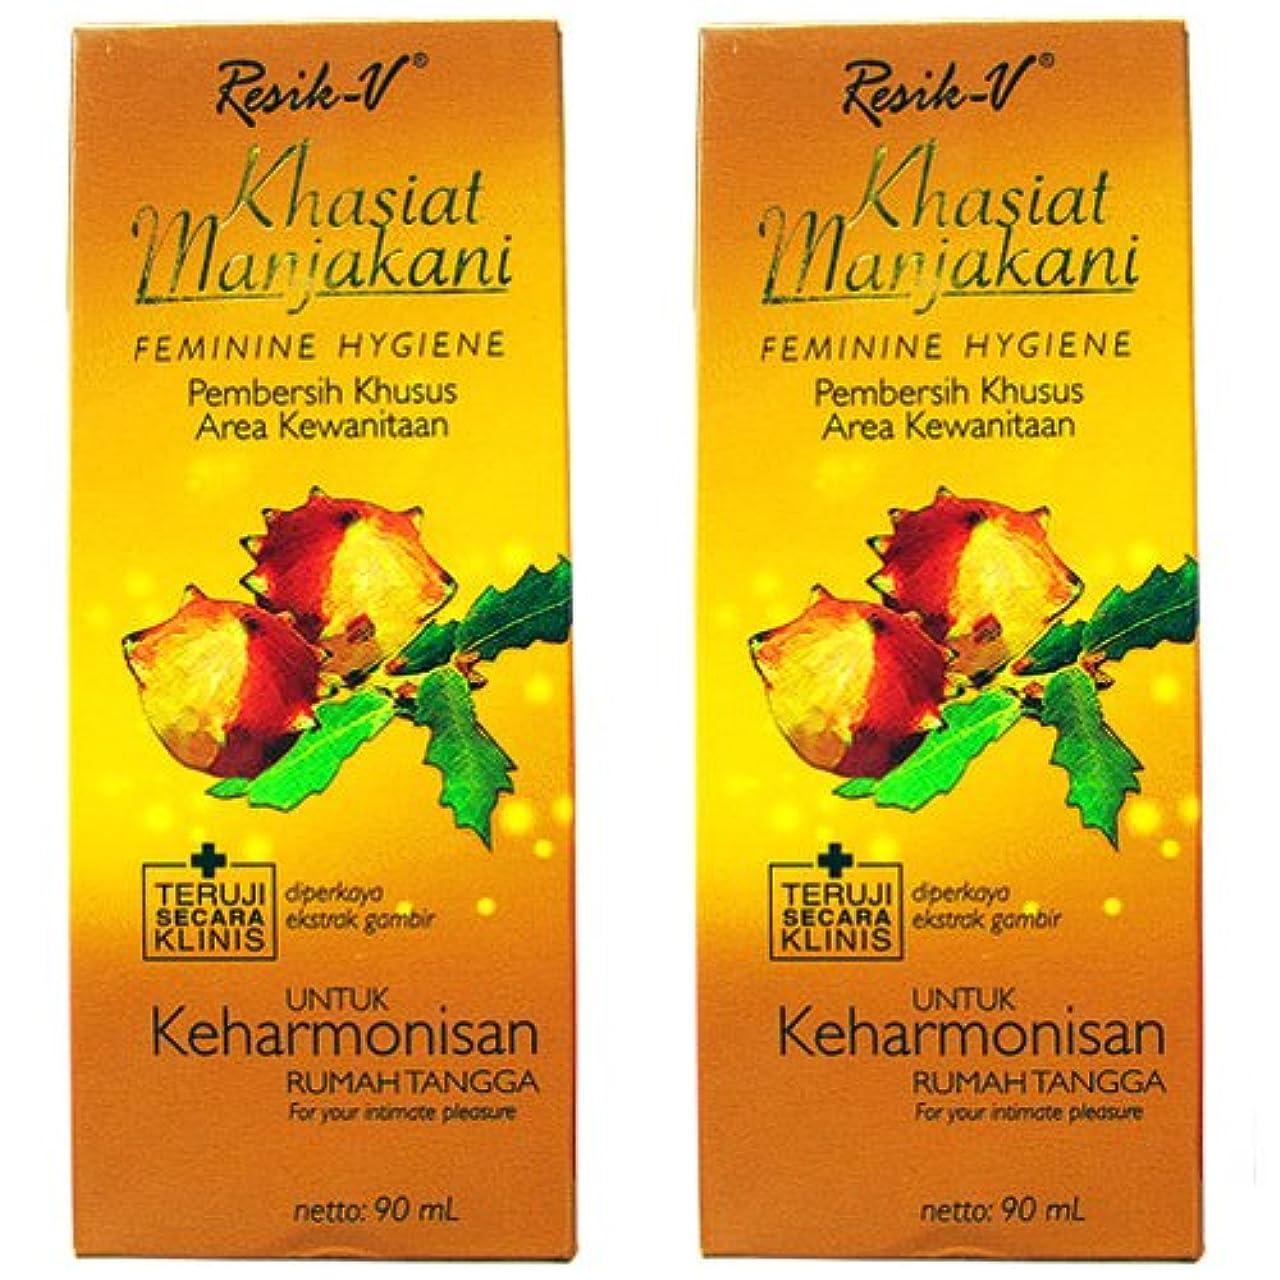 Resik-V マンジャカニ 女性用液体ソープ90ml 2本セット [並行輸入品][海外直送品]